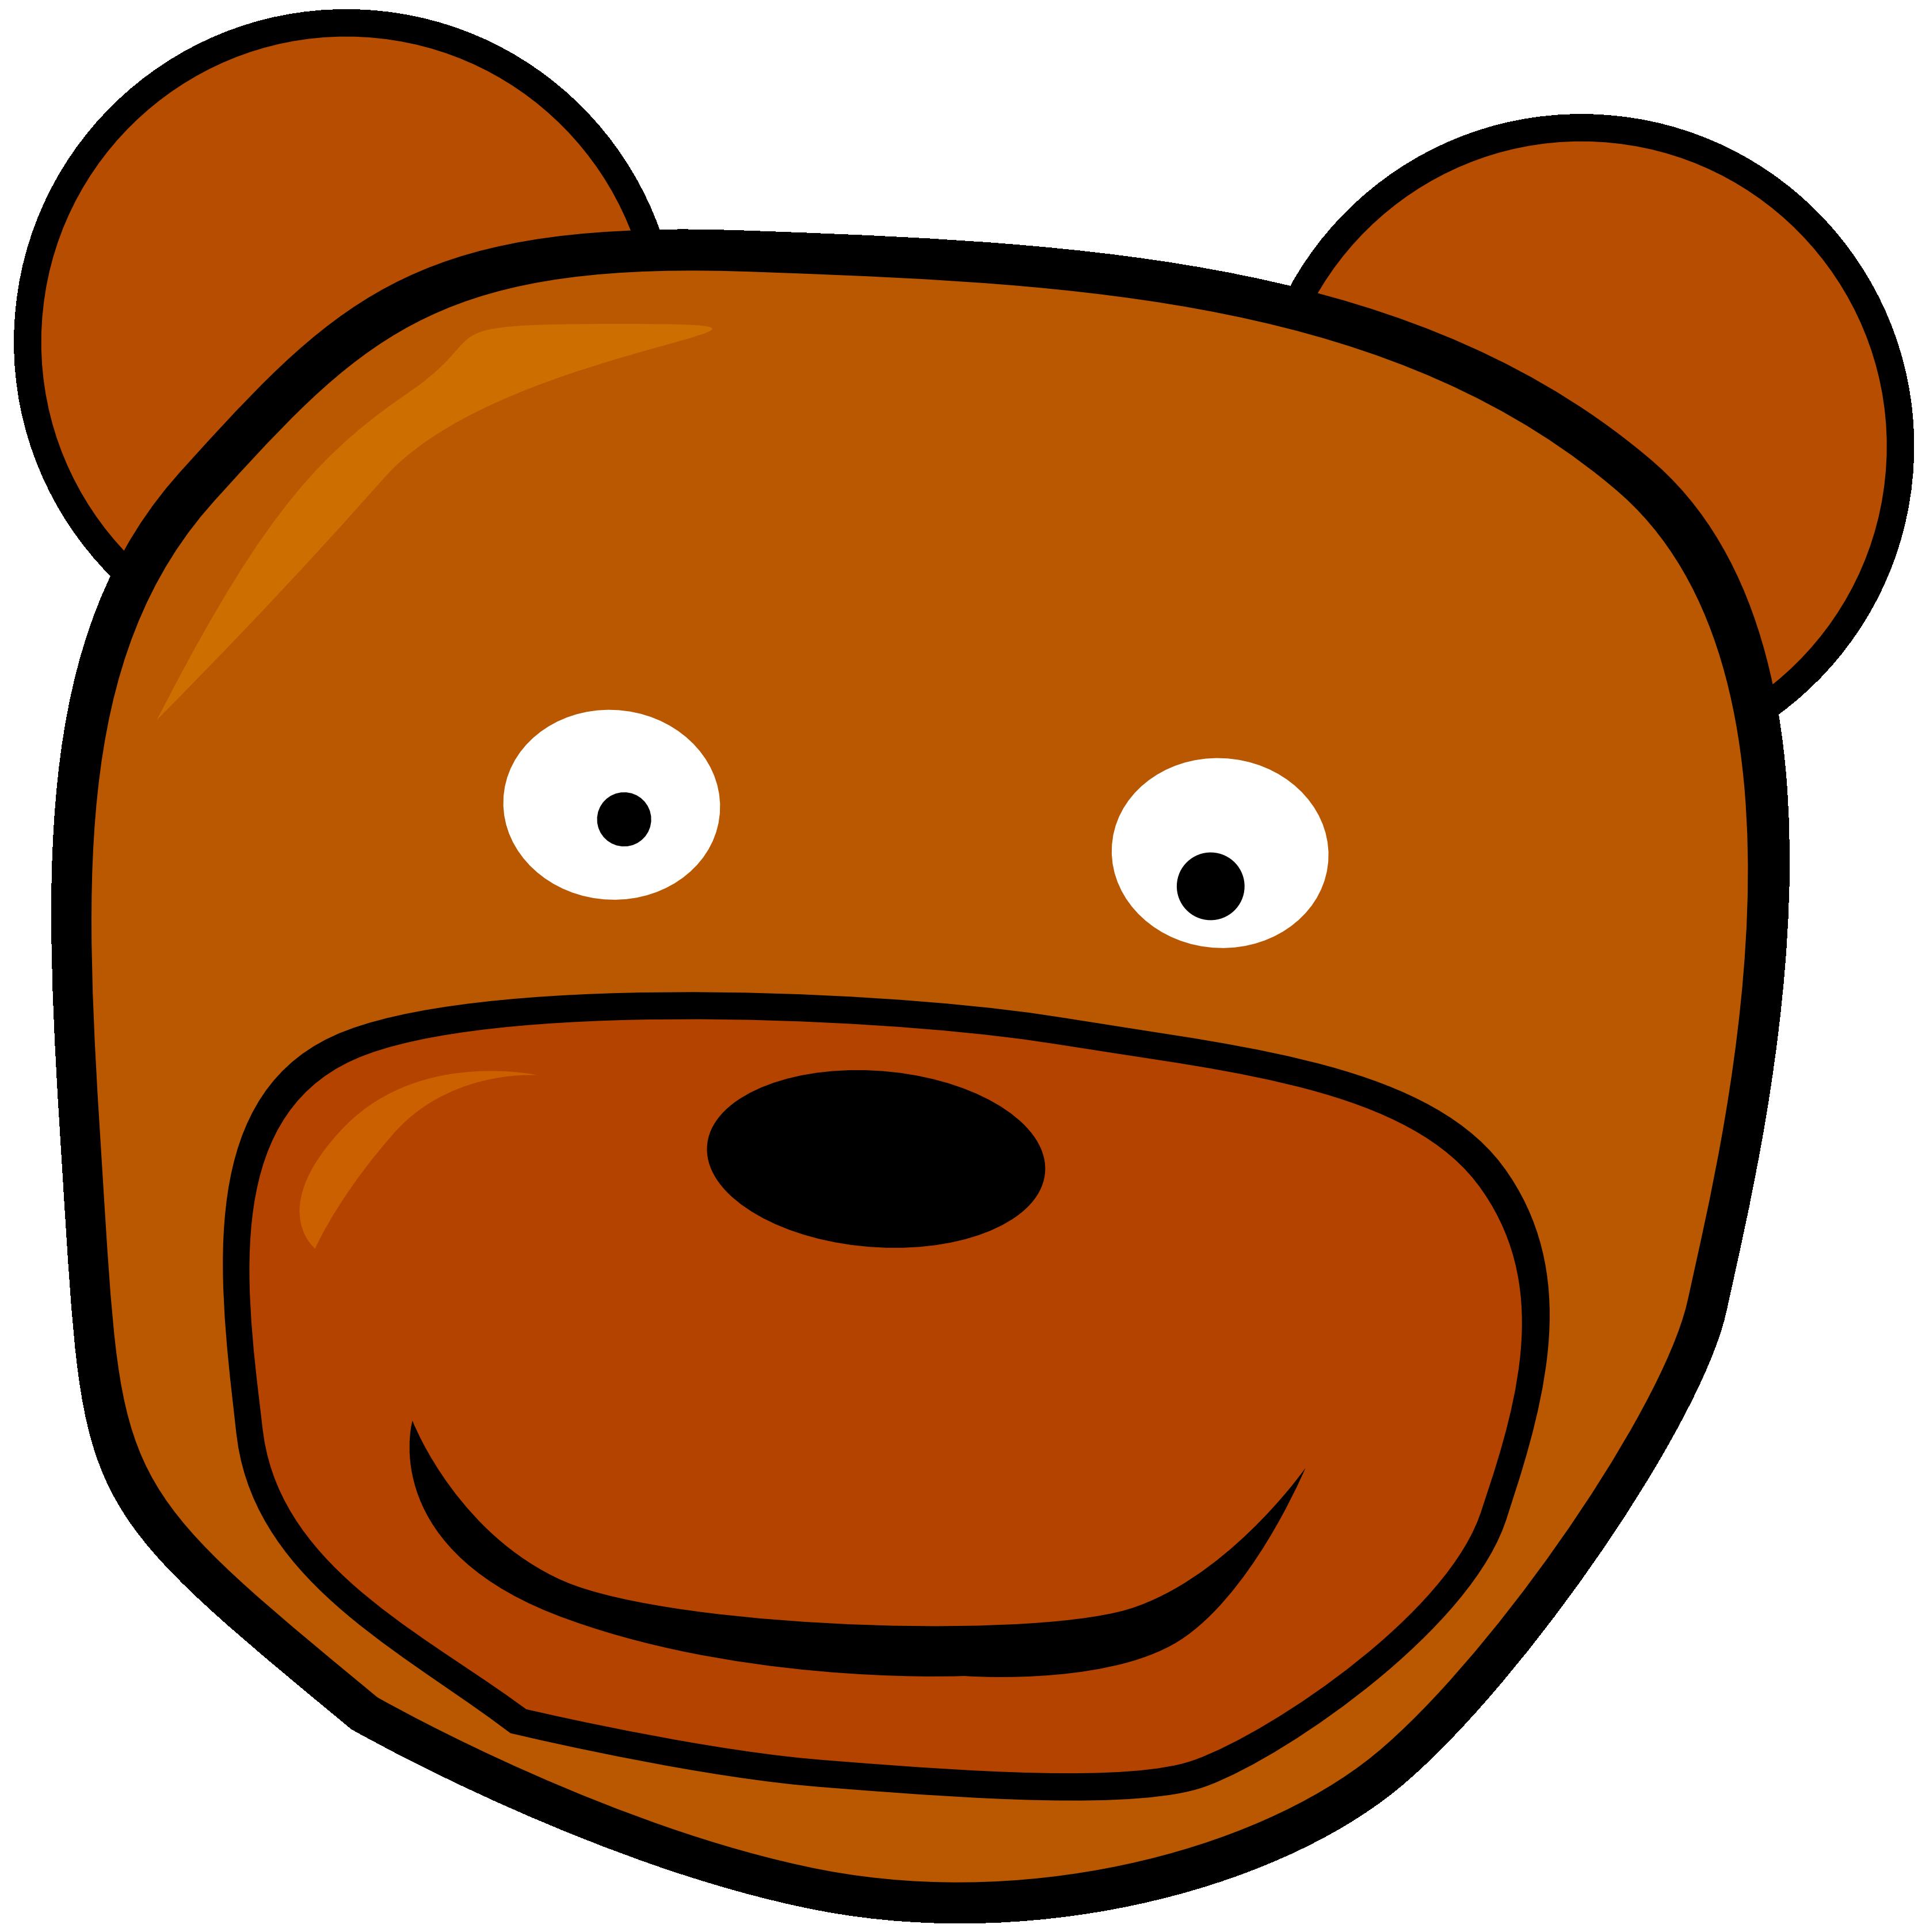 Head clipart question. Panda free images bearheadclipartblackandwhite